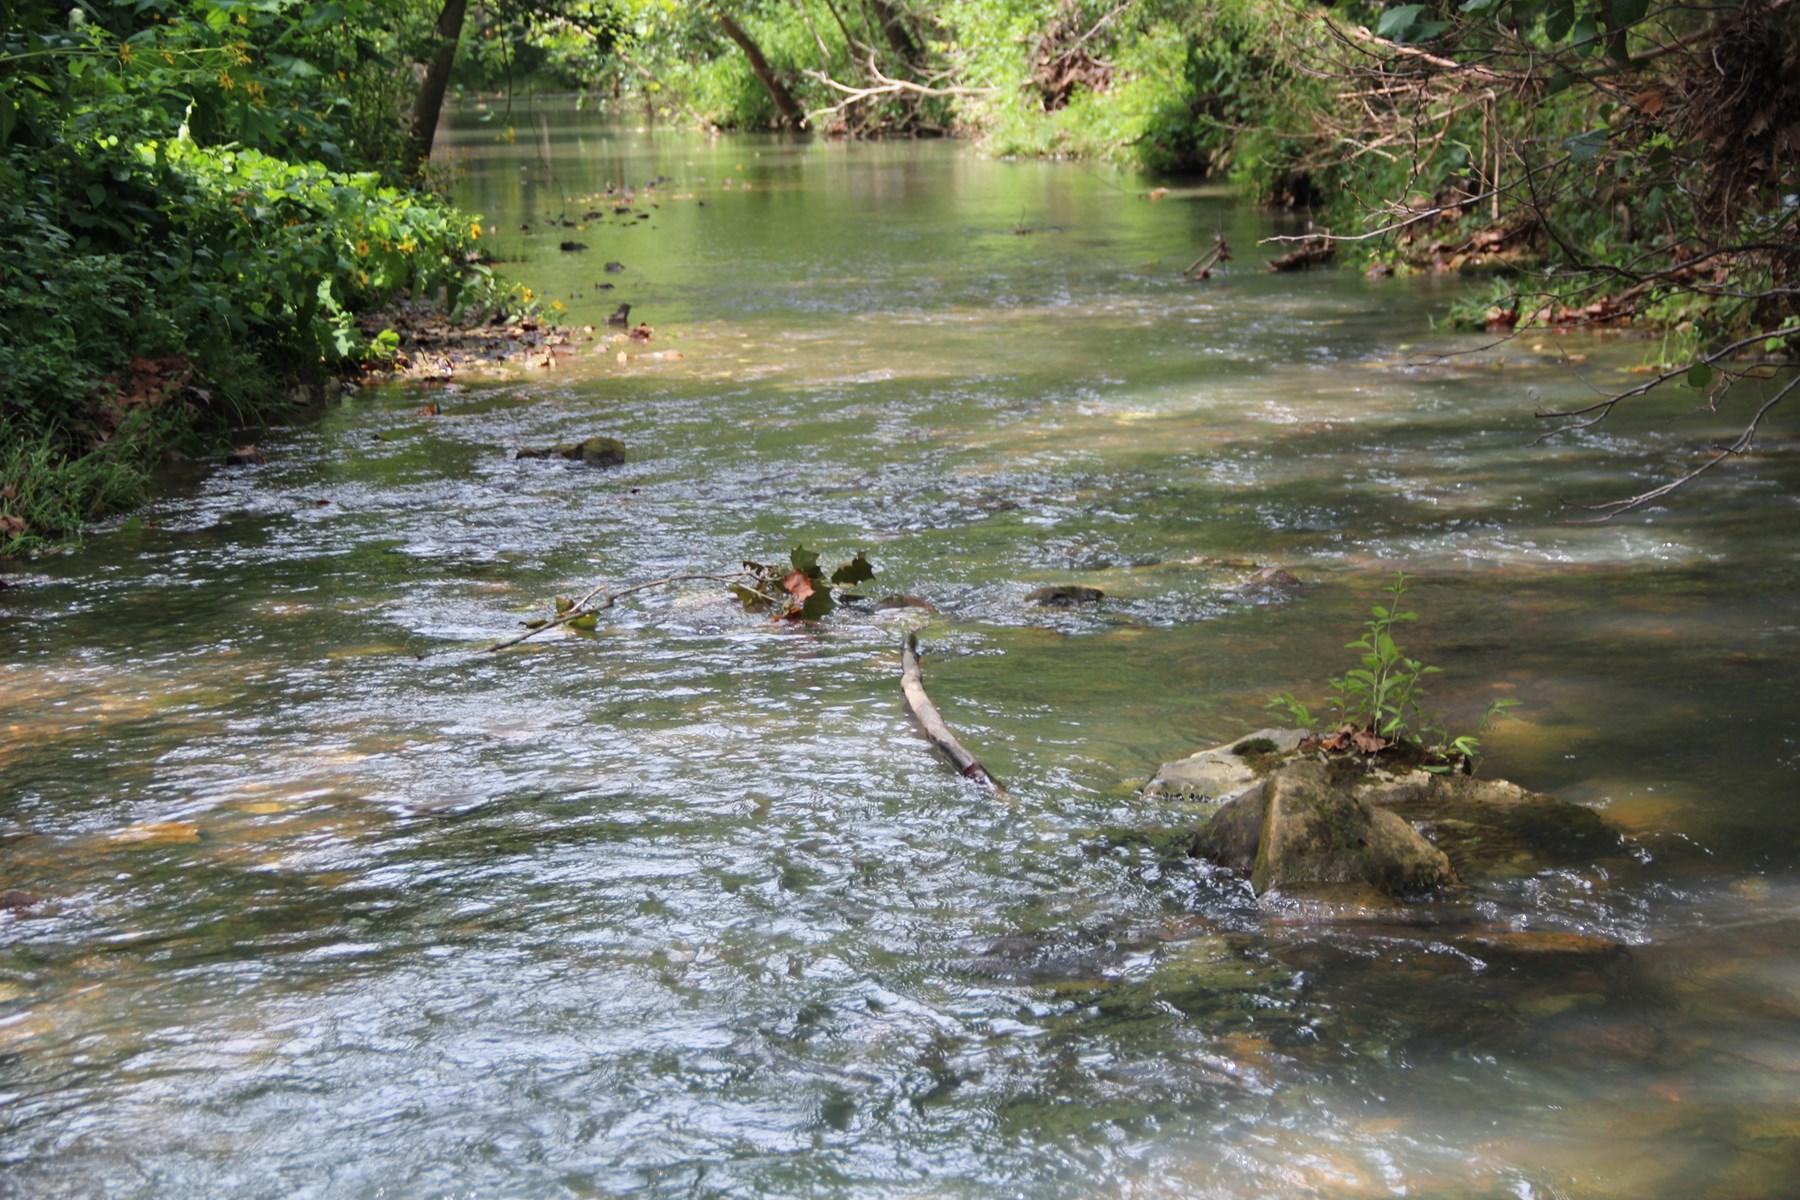 Dryfork creek